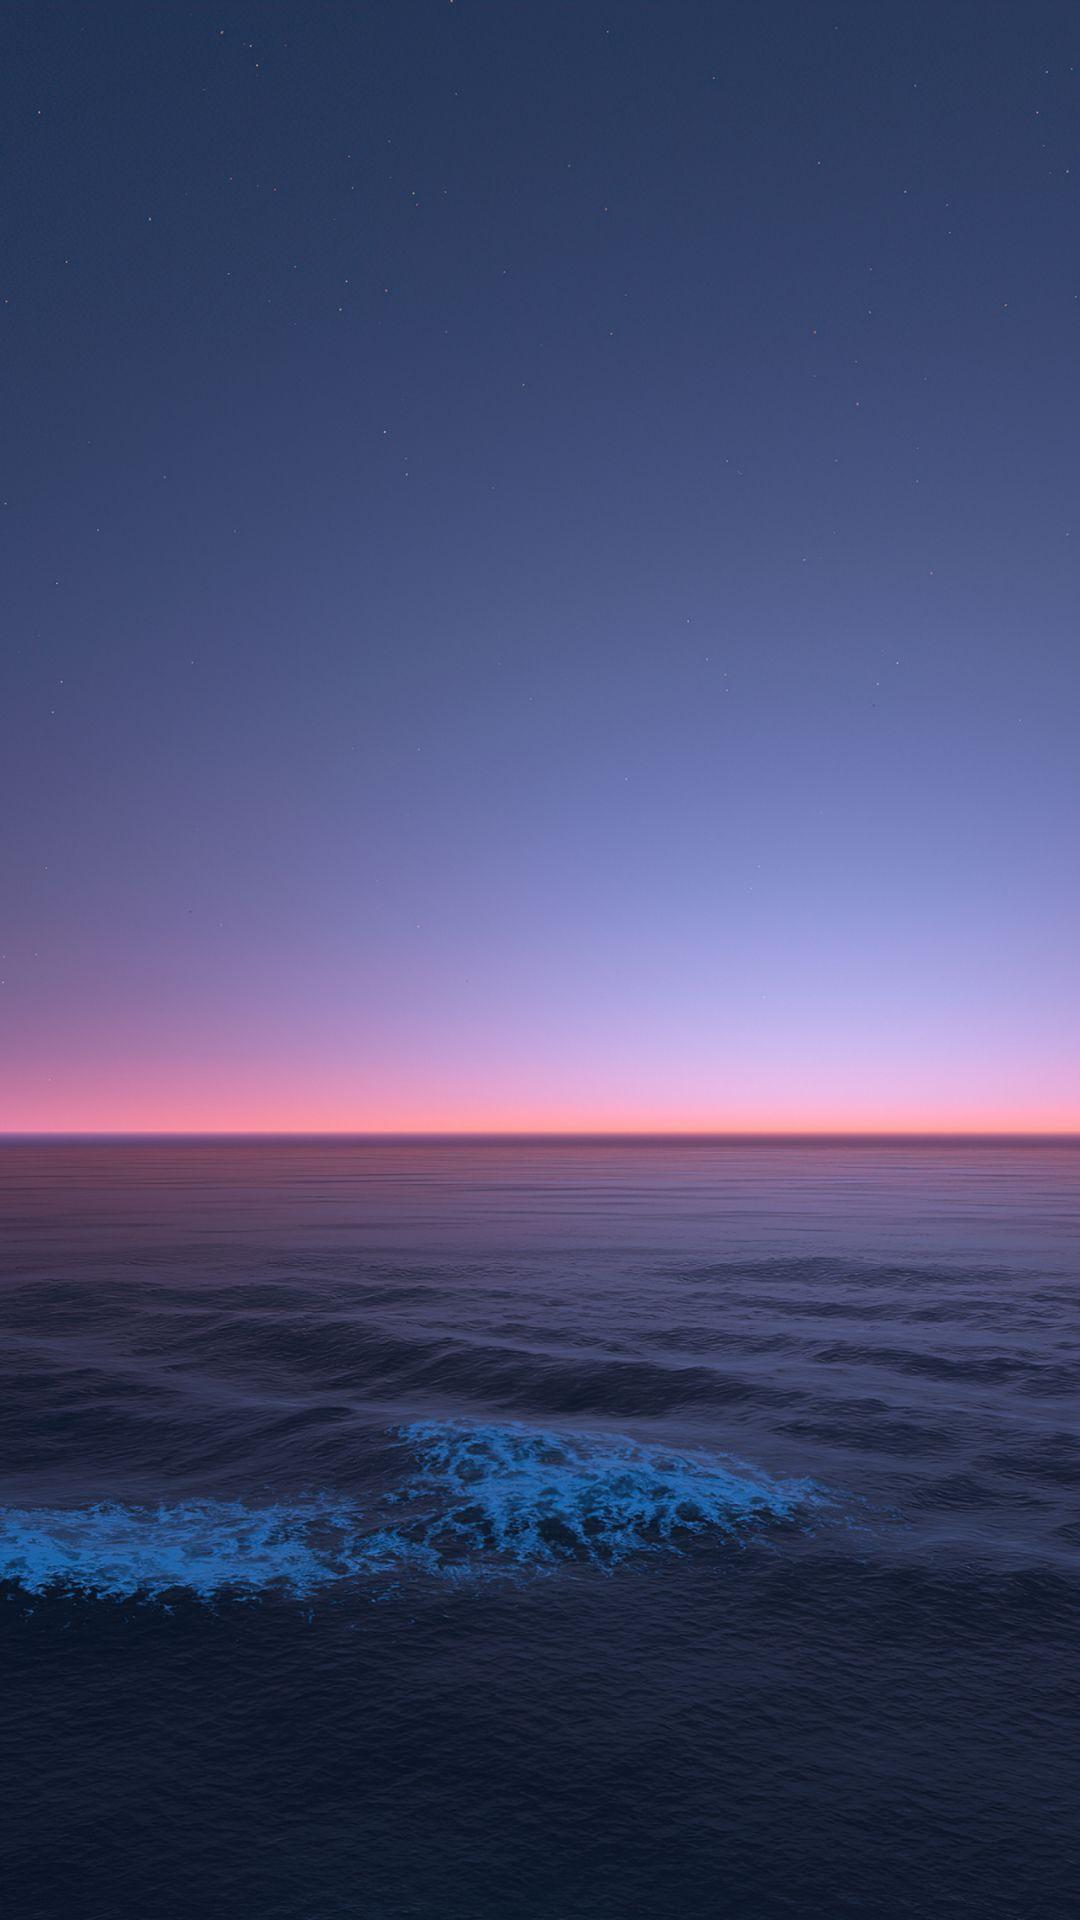 Calm sea, seascape, twilight, nature, 1080x1920 wallpaper